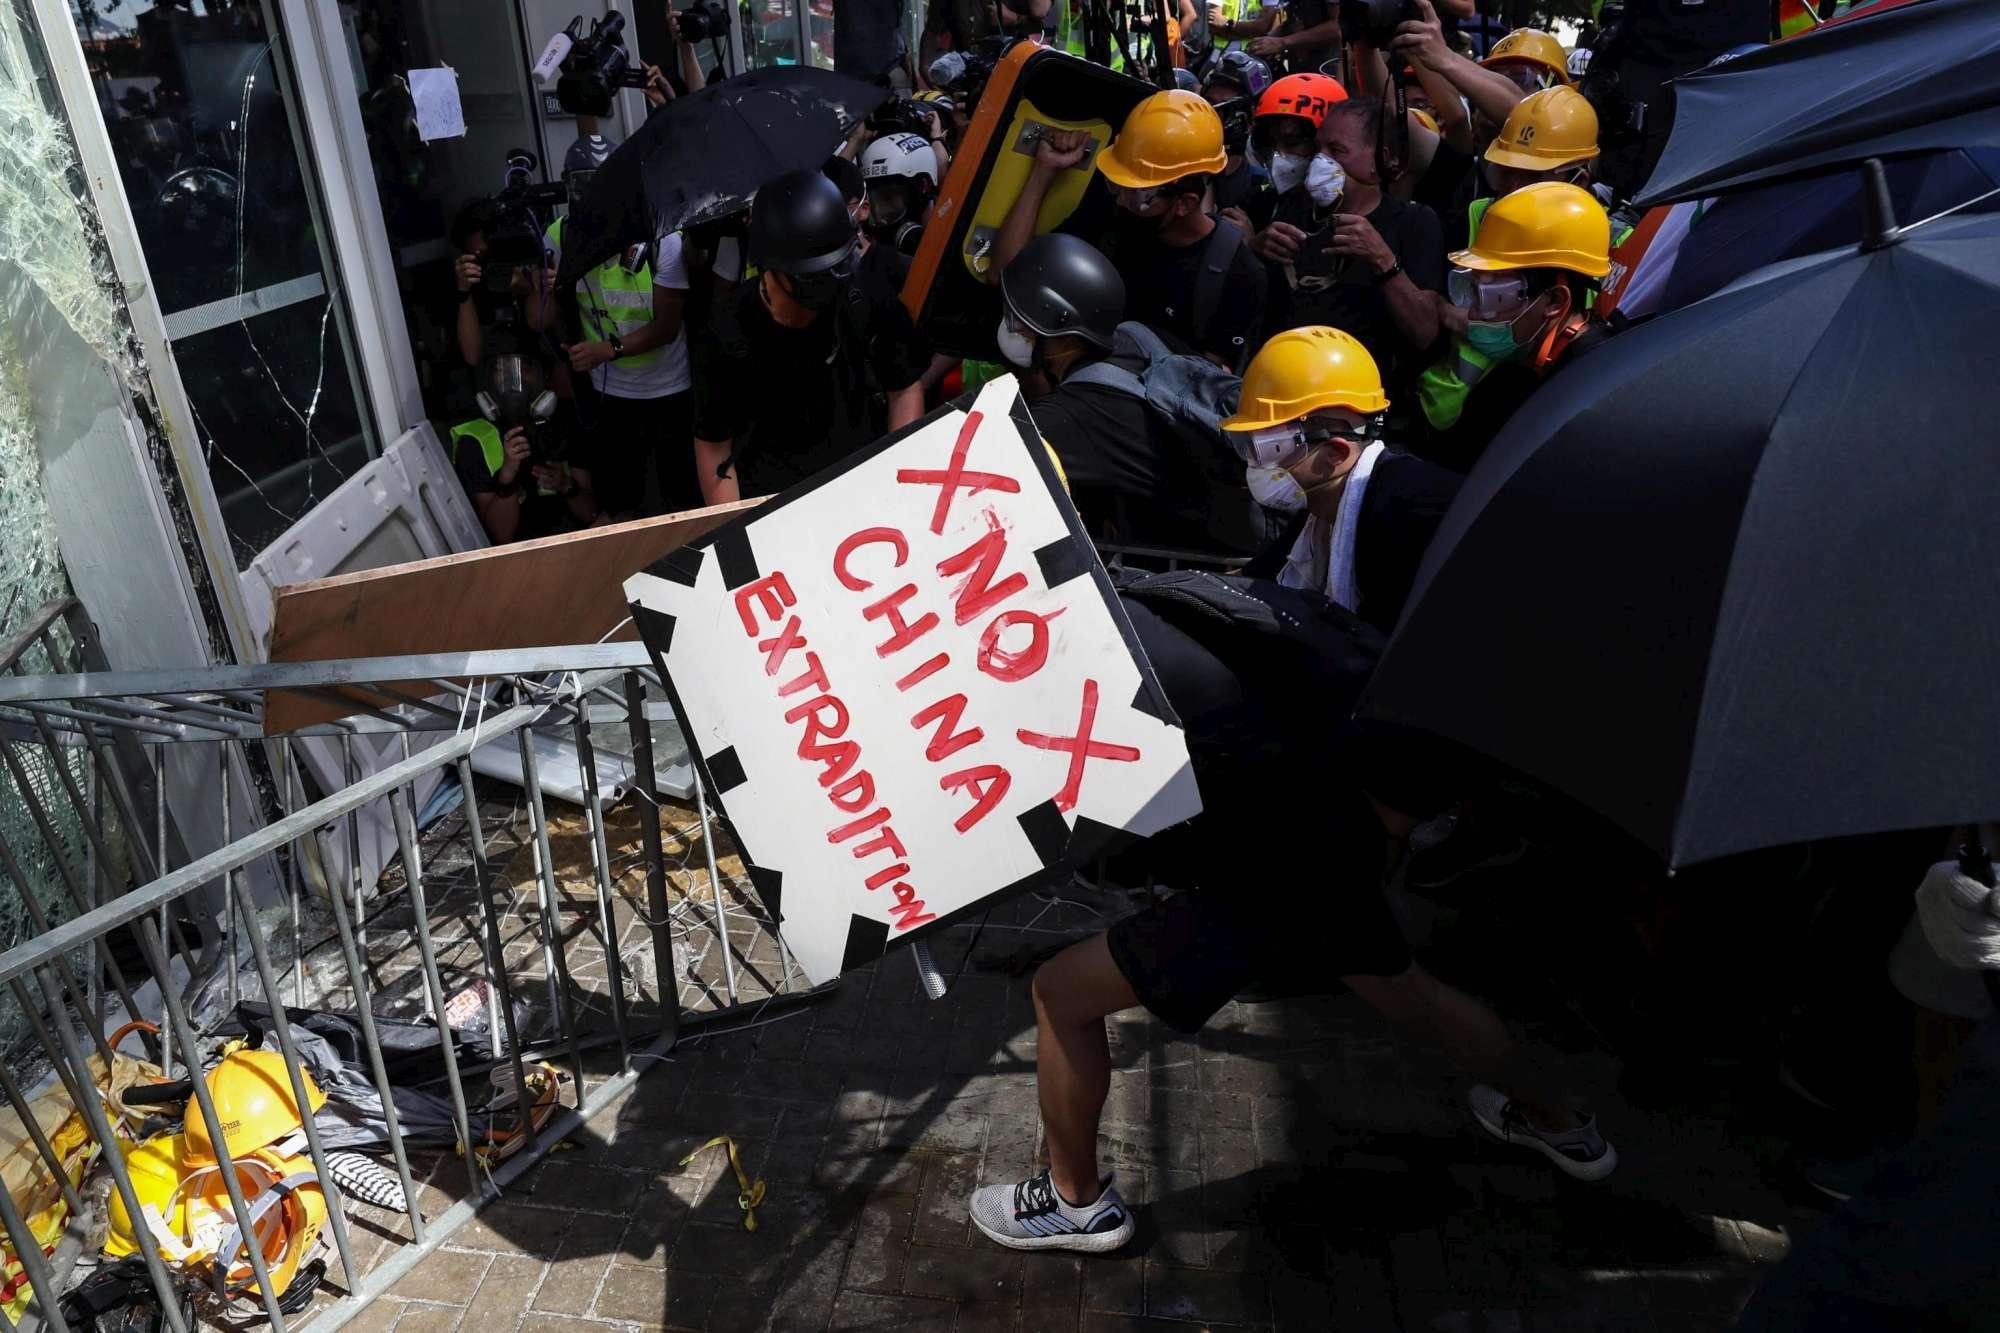 Hong Kong, proseguono le proteste